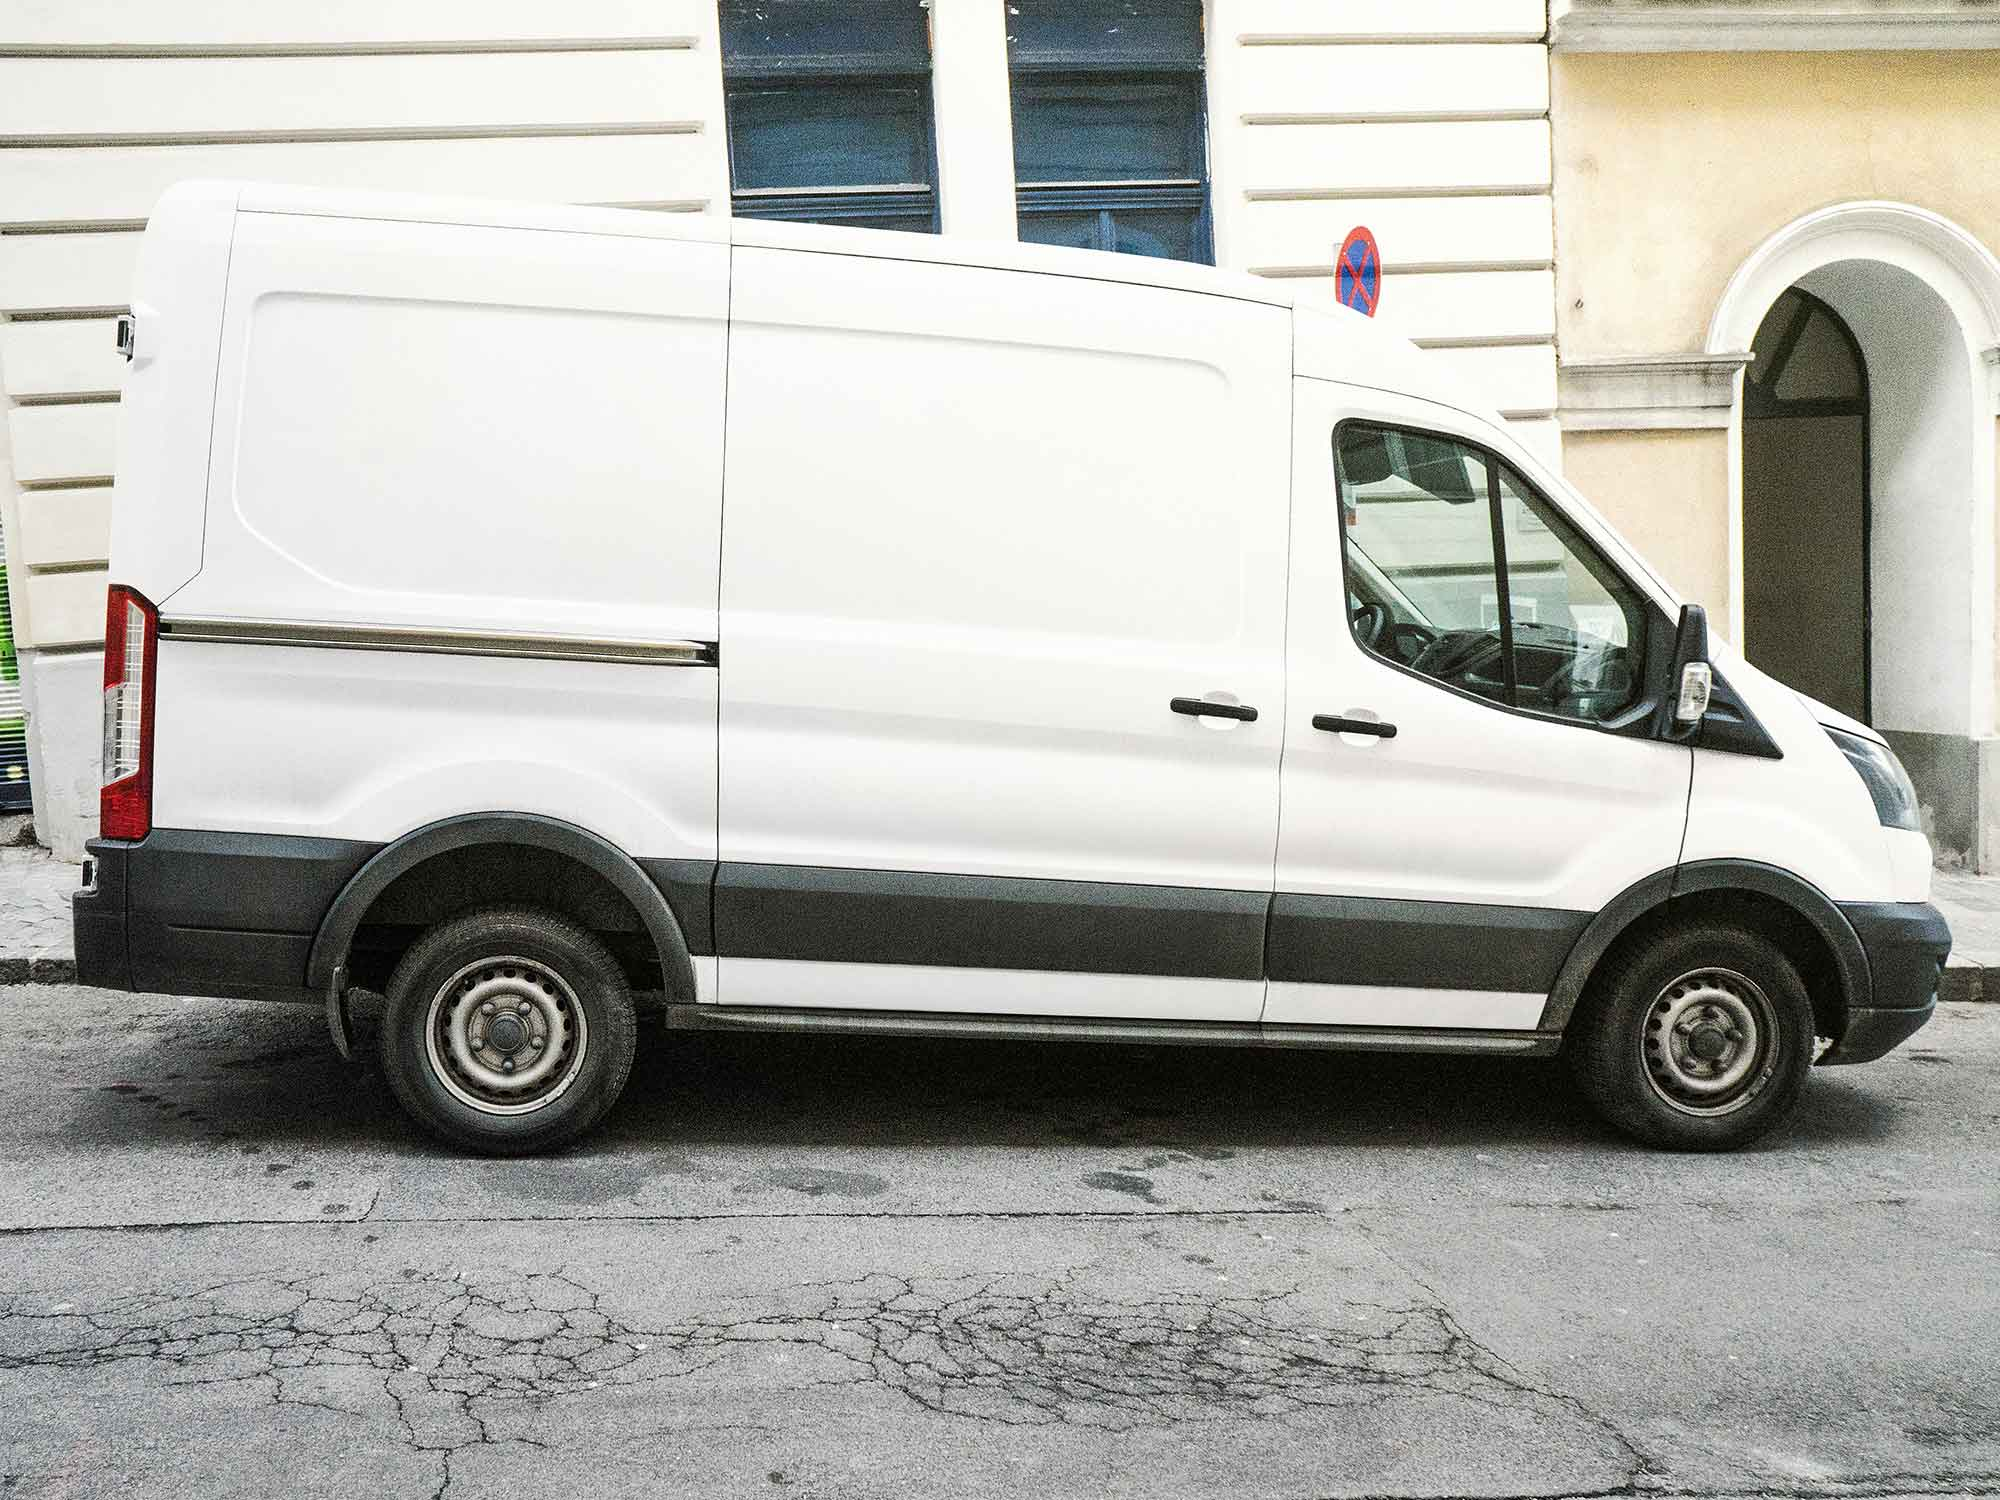 Delivery Car Mockup 2